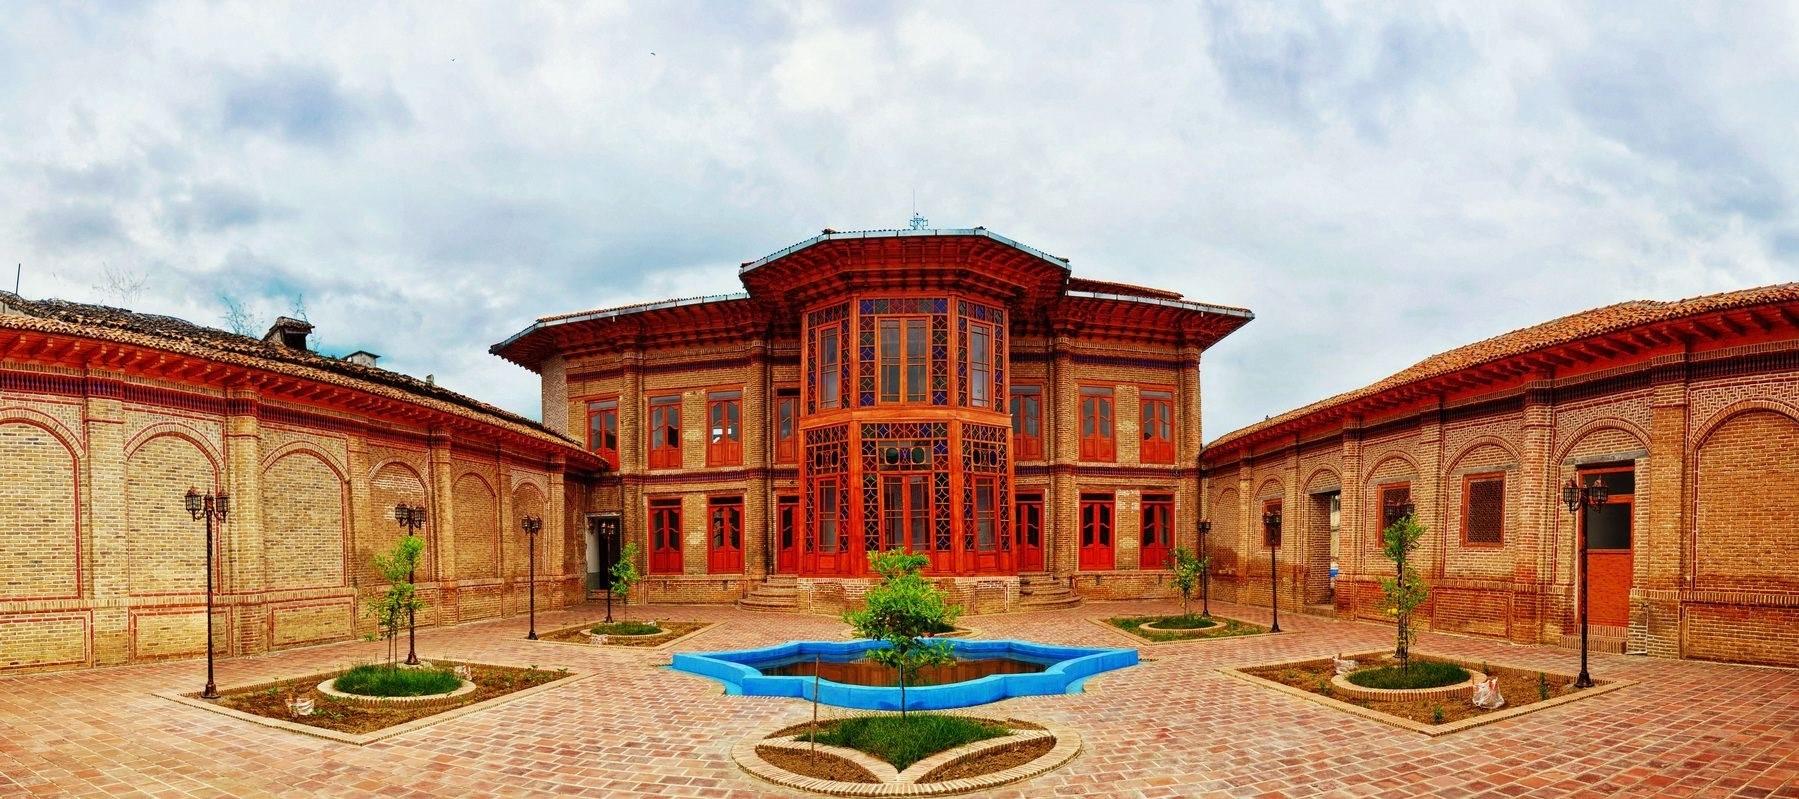 عمارت فاضلی ، ساری